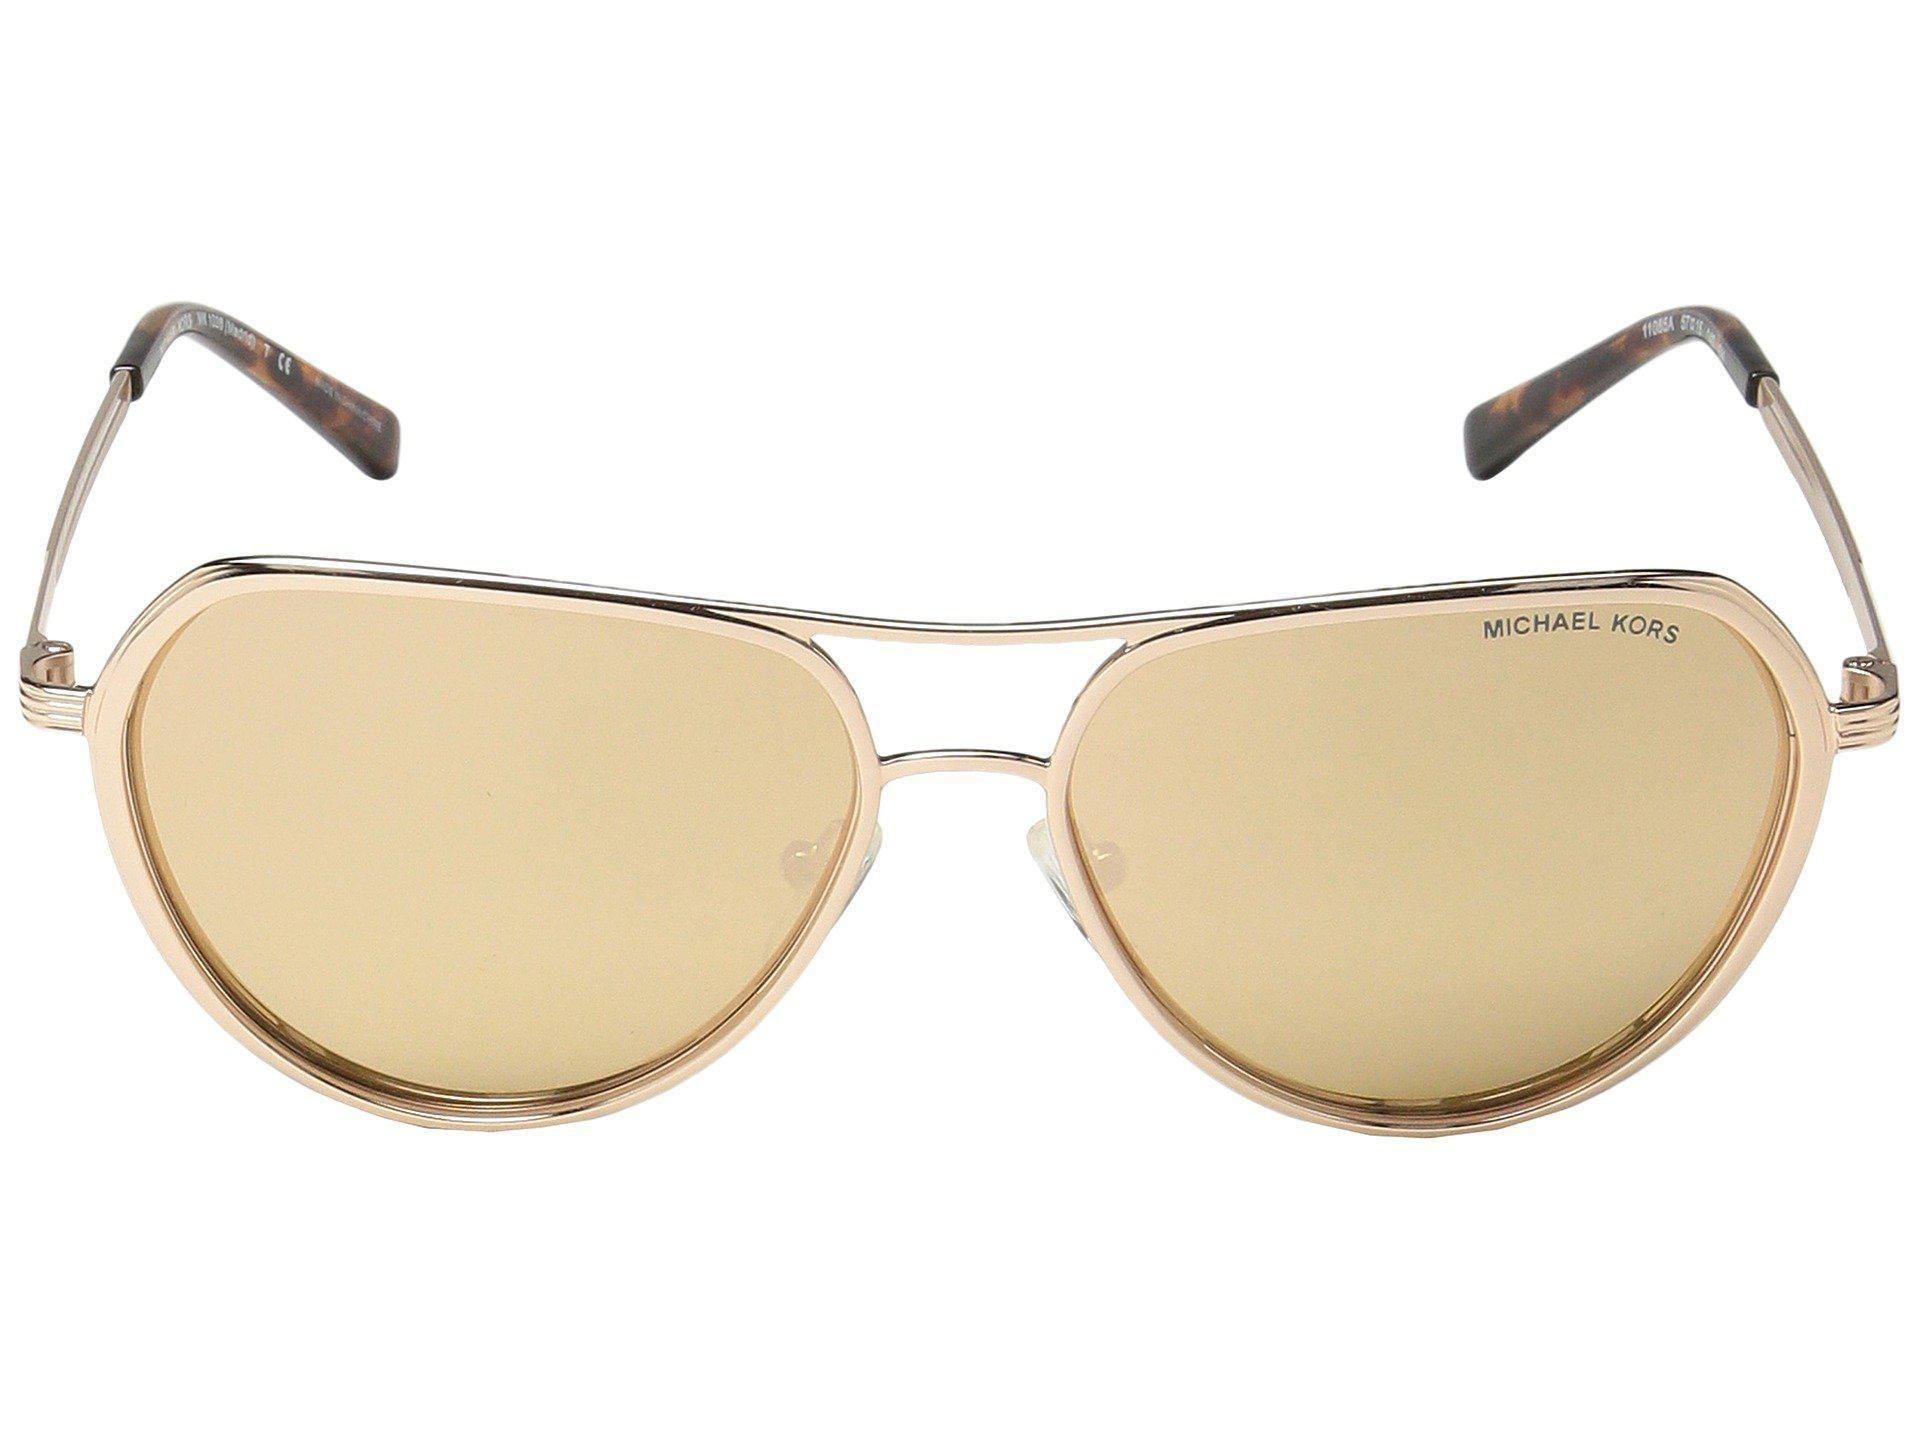 746ebd04b7f3 Michael Kors Madrid Gold   Gold Lens Mirror Sunglasses – shadesdaddy